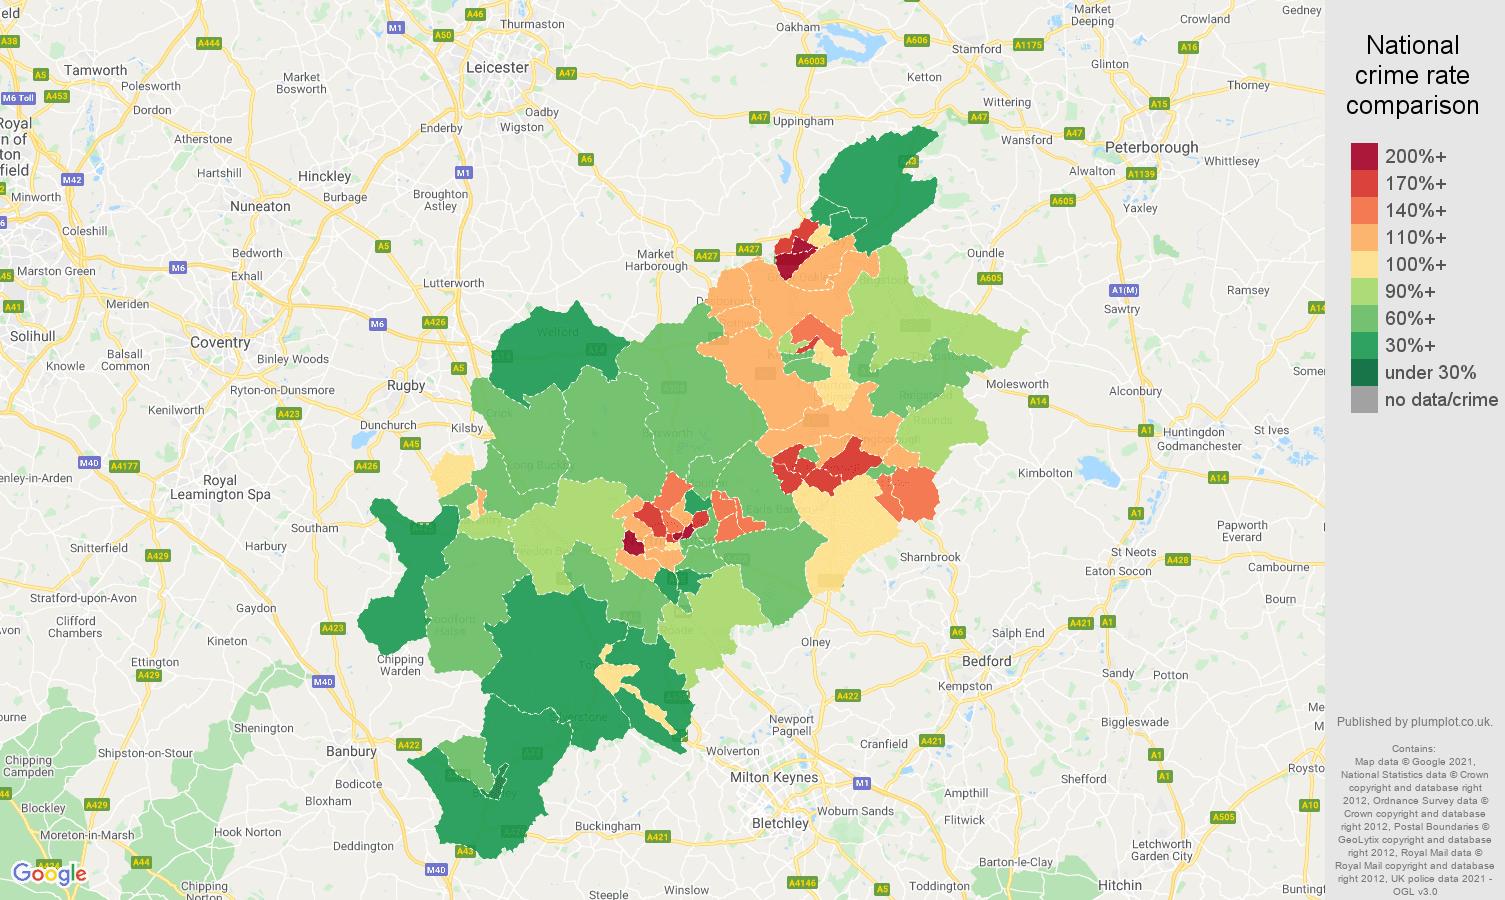 Northampton criminal damage and arson crime rate comparison map